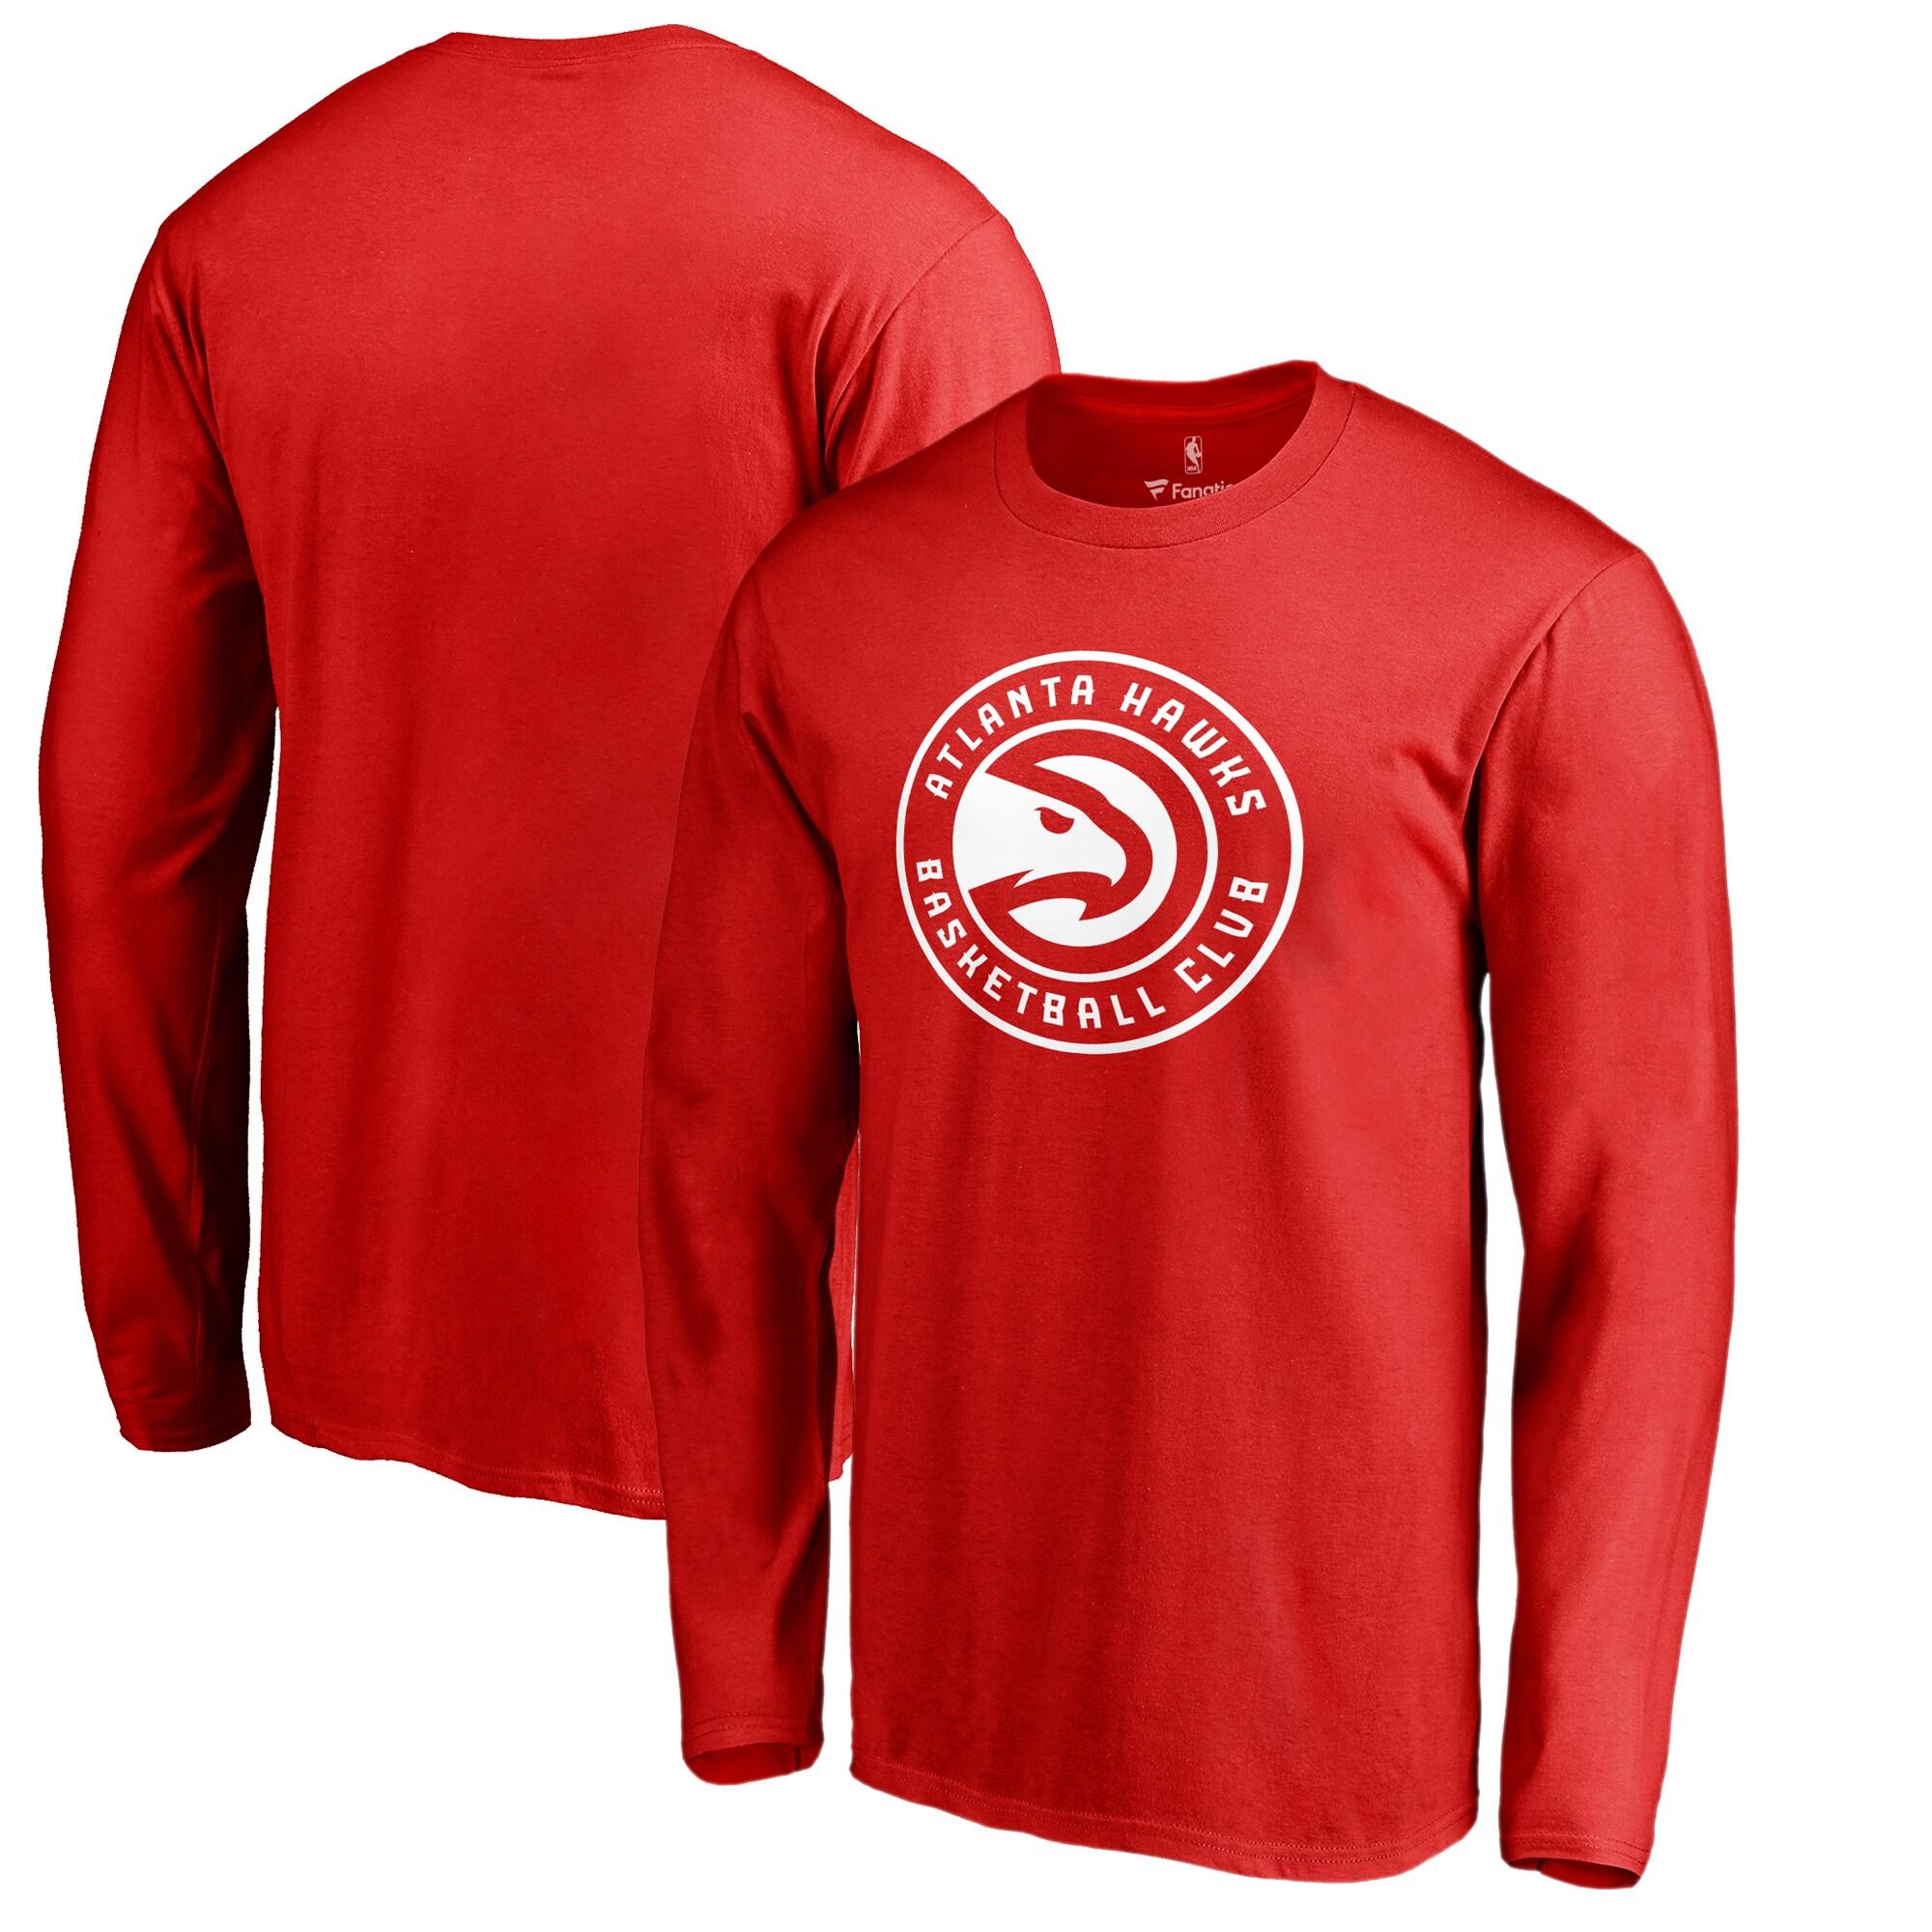 Atlanta Hawks Fanatics Branded Big & Tall Primary Logo Long Sleeve T-Shirt - Red